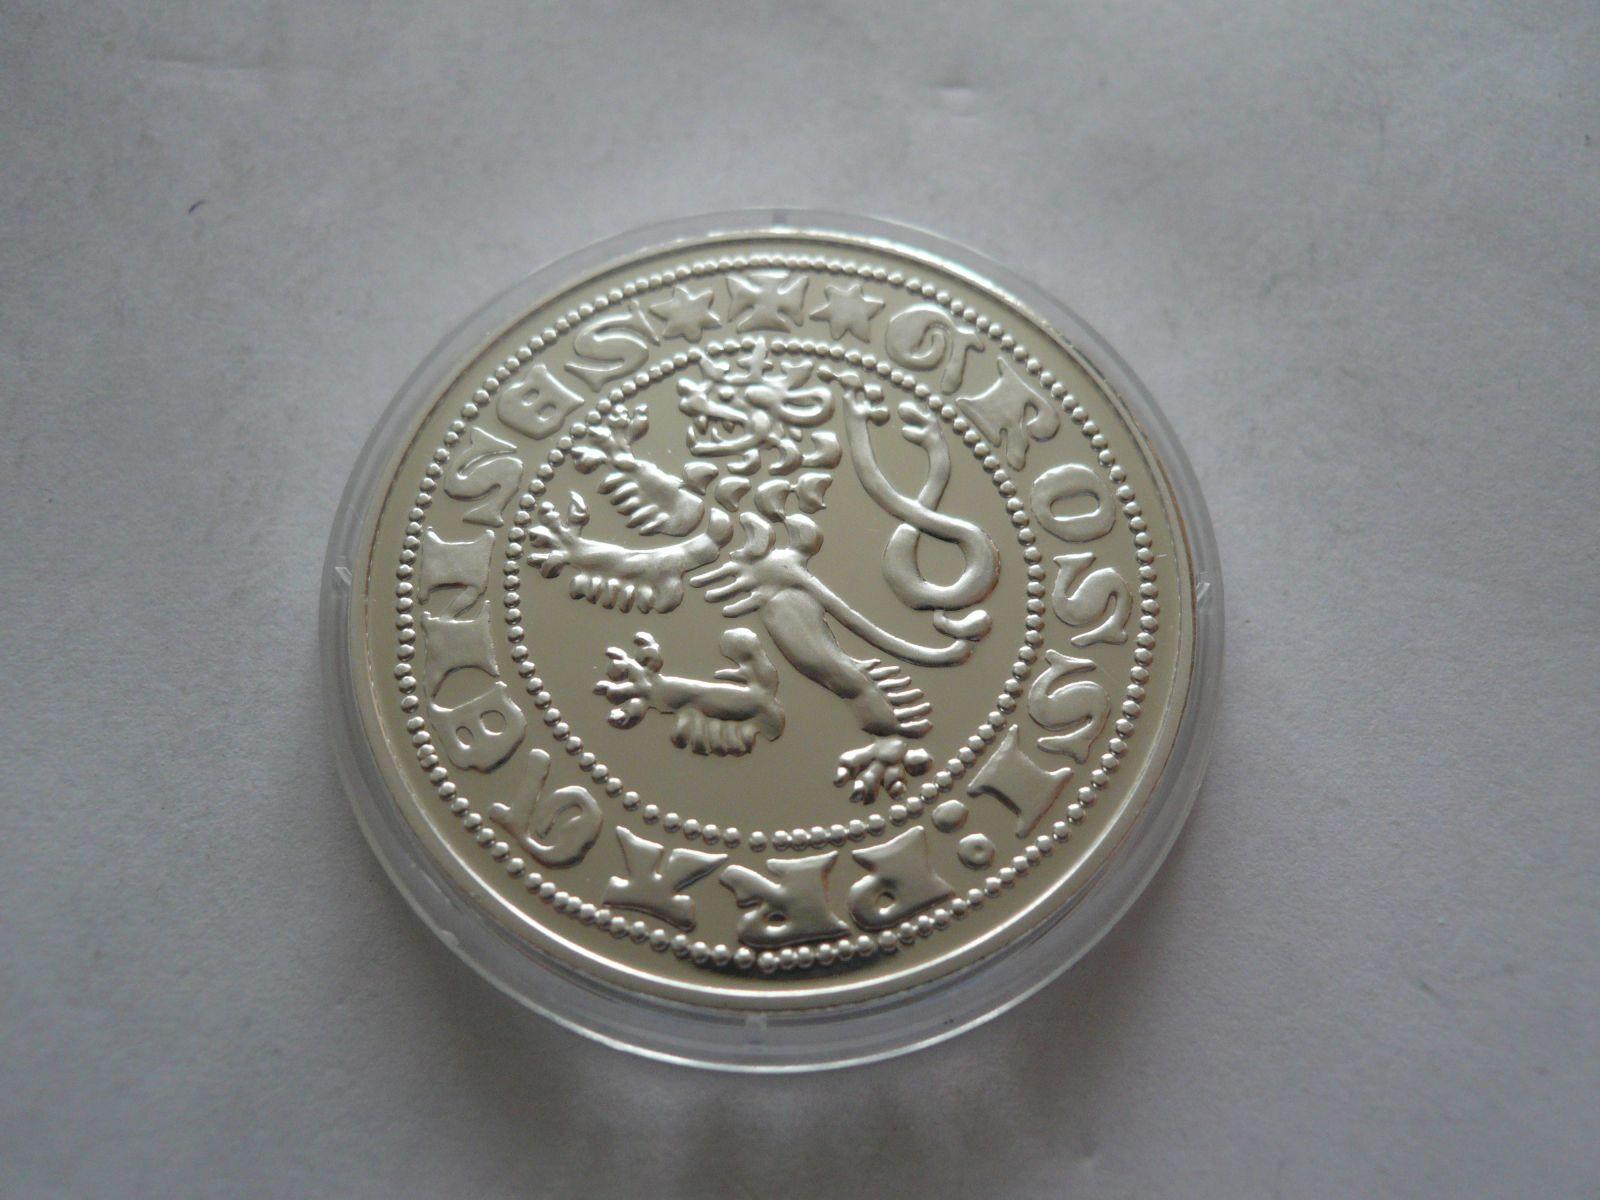 medaile Pražský groš, ČSR